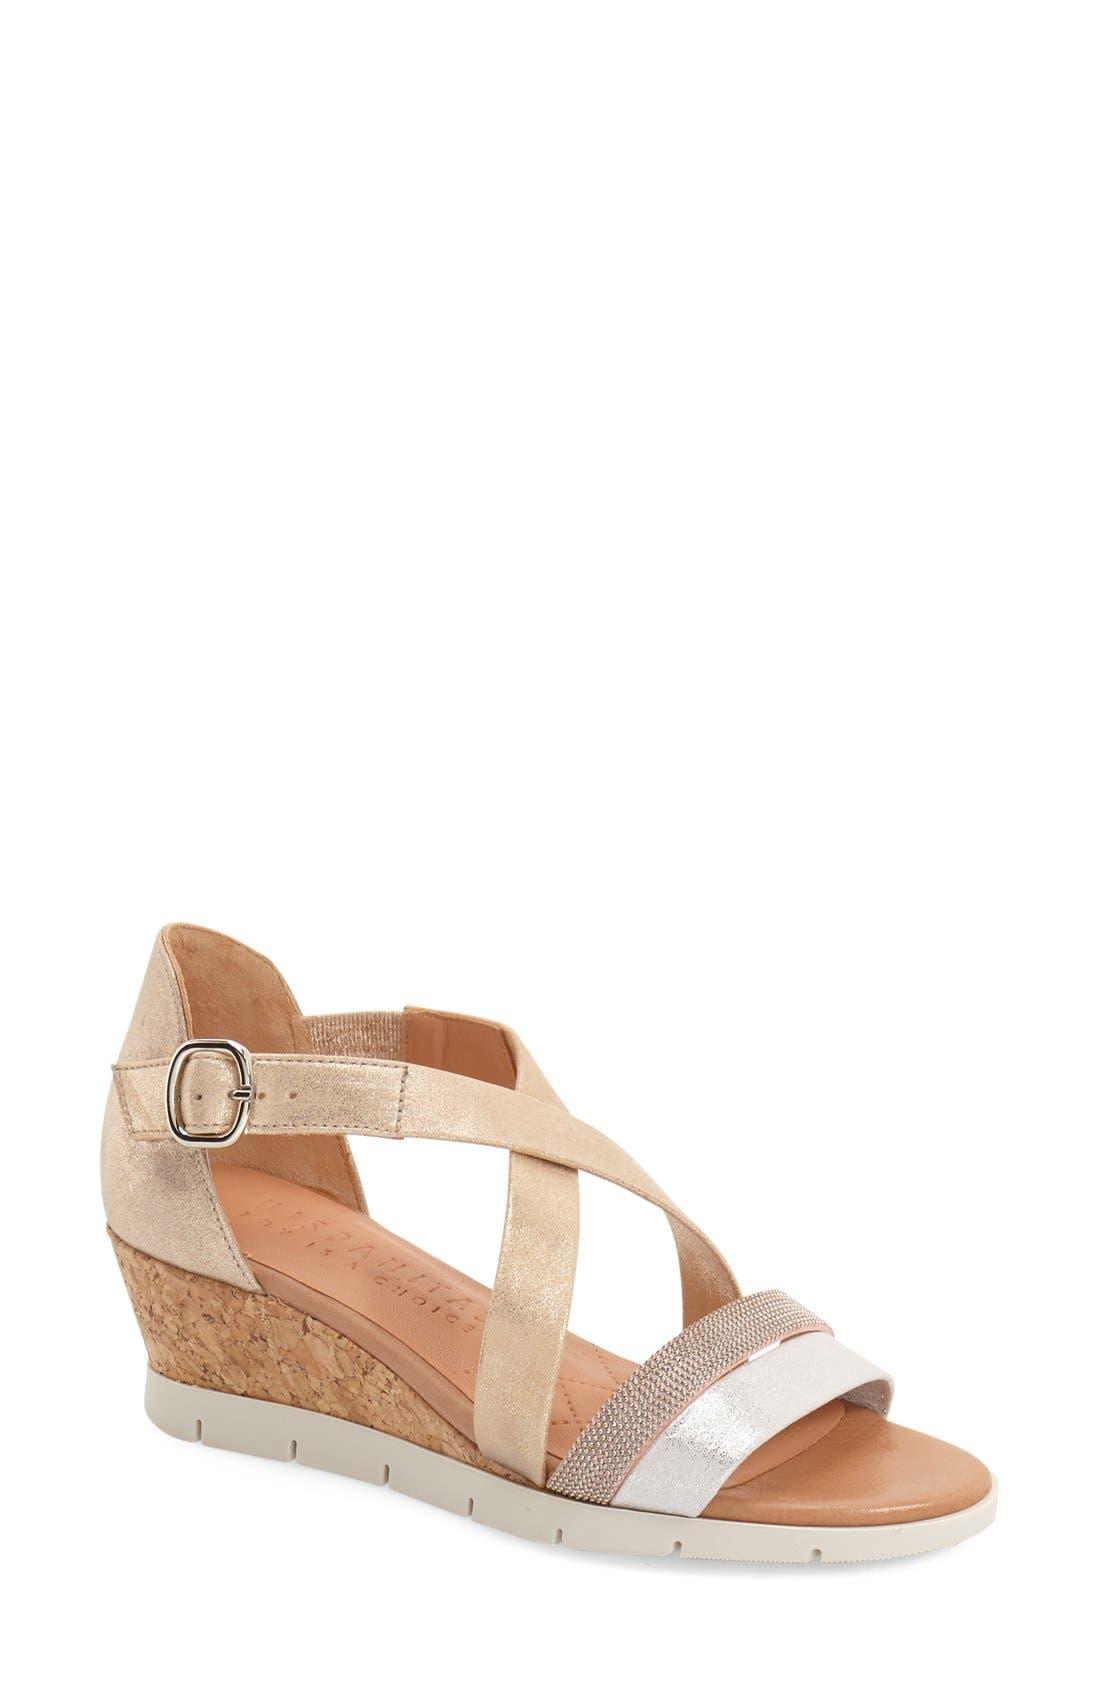 'Kennedi' Wedge Sandal,                         Main,                         color,